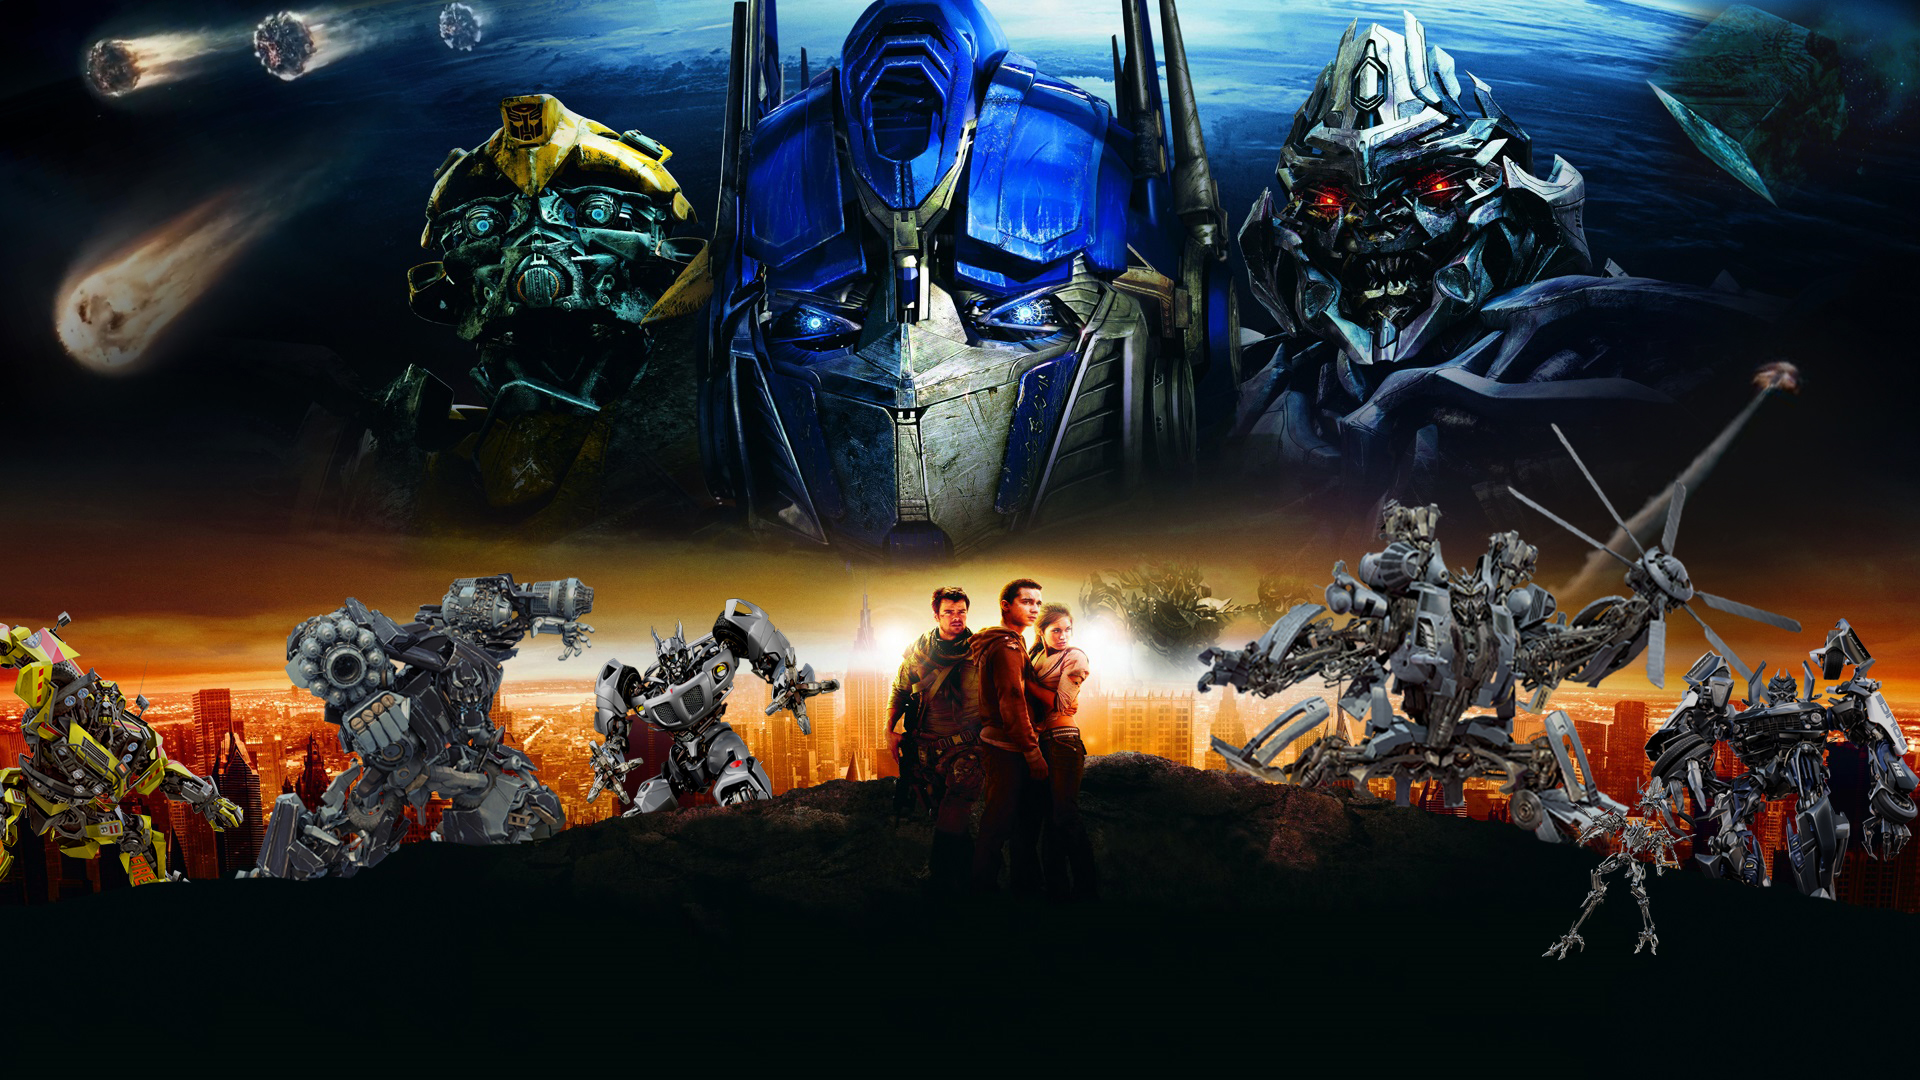 Transformers Wallpaper by TheDarkMamba995 on DeviantArt